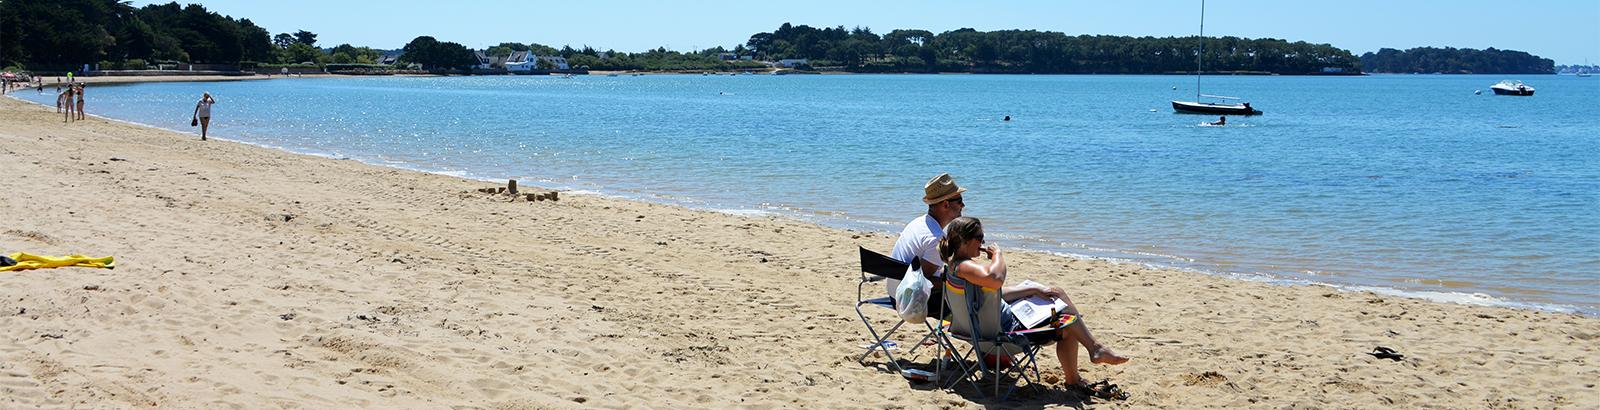 Locmiquel strand 150m van de Villa de la Plage